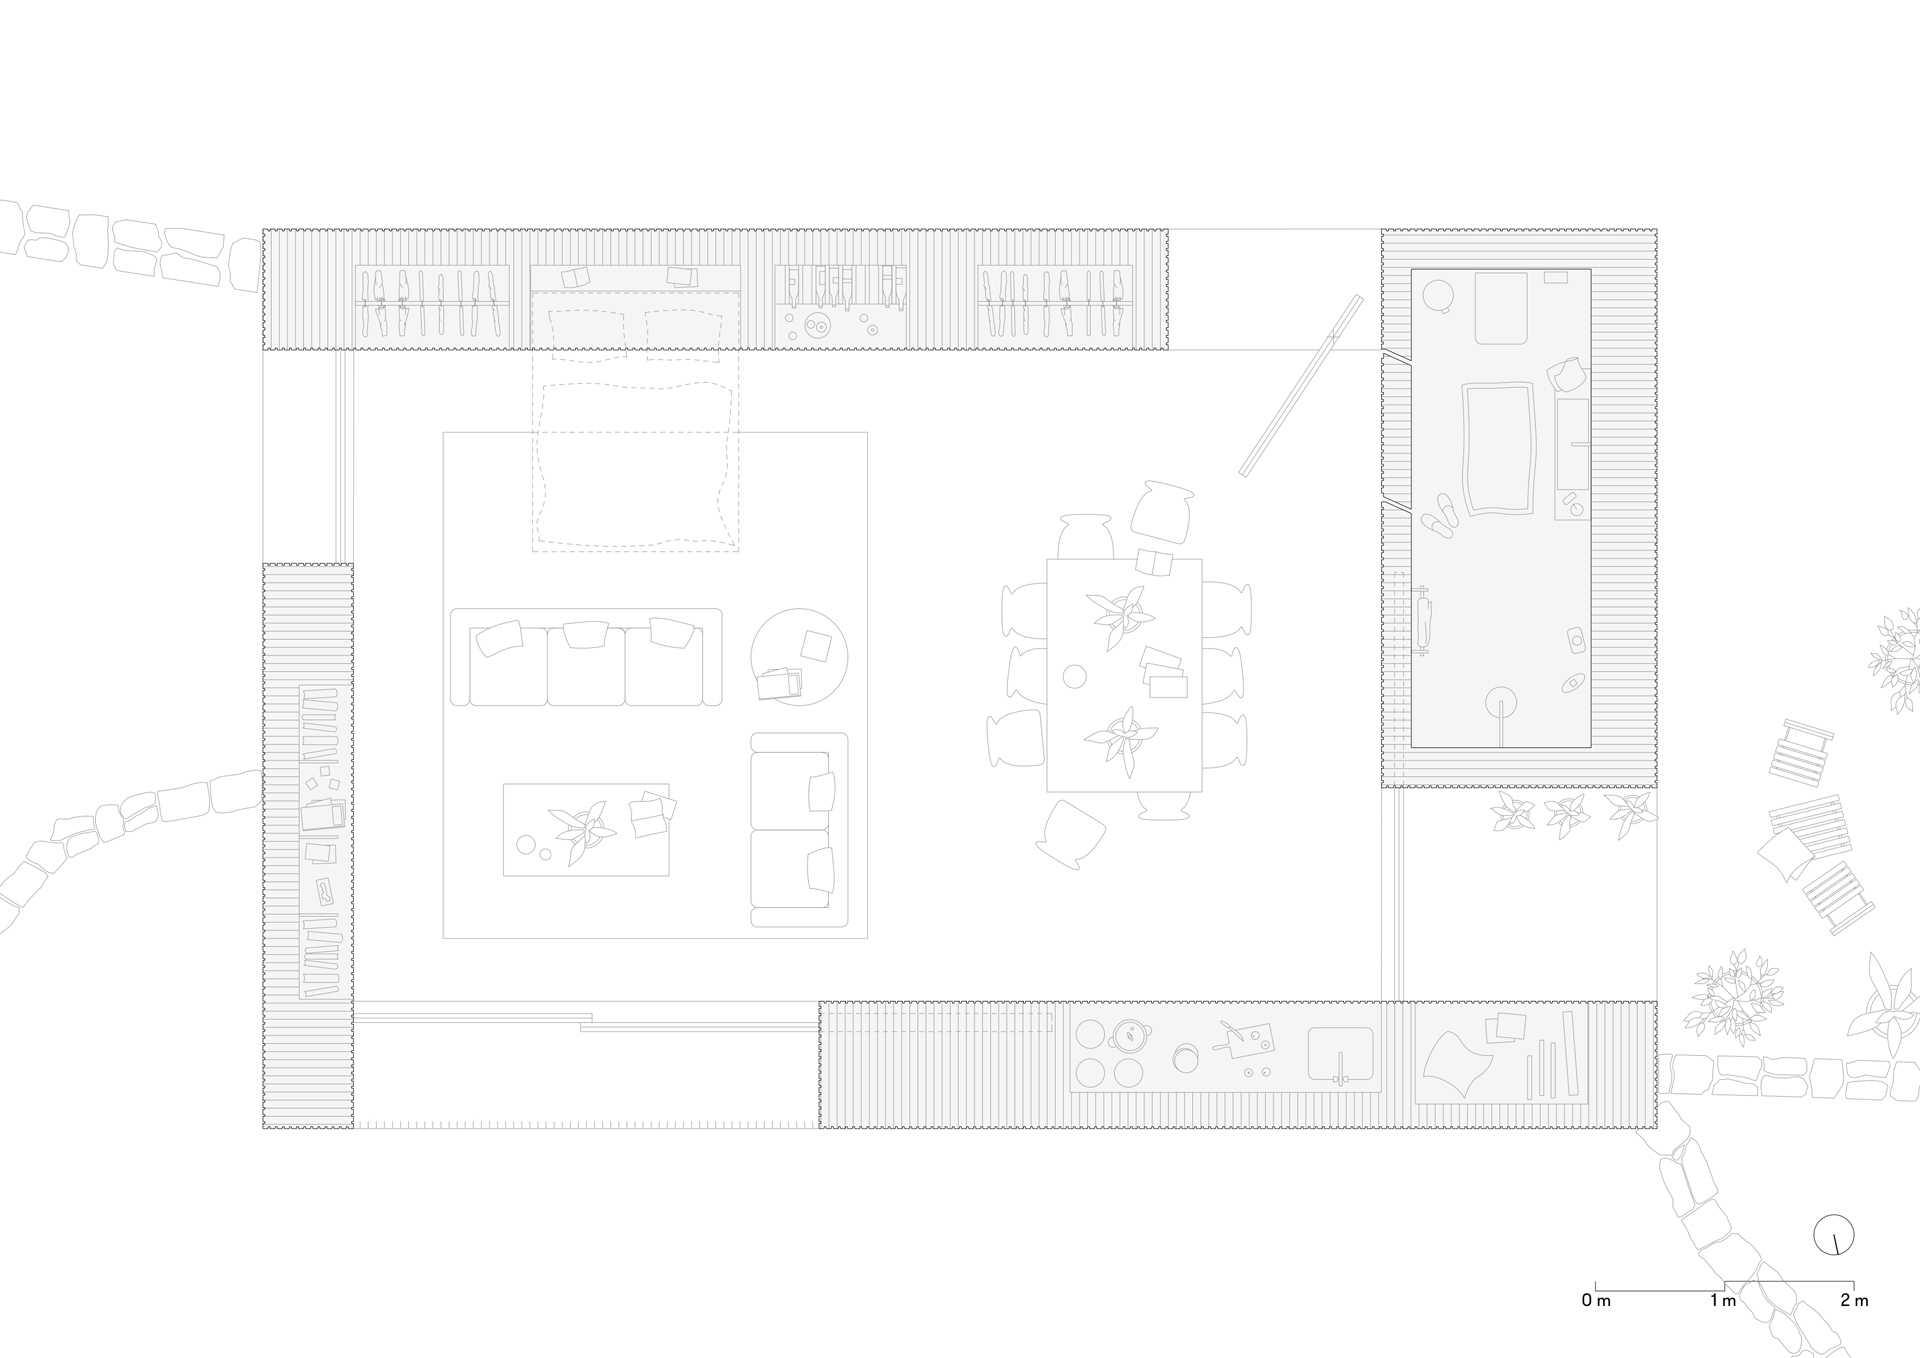 Pavilon House  - 43 8 49